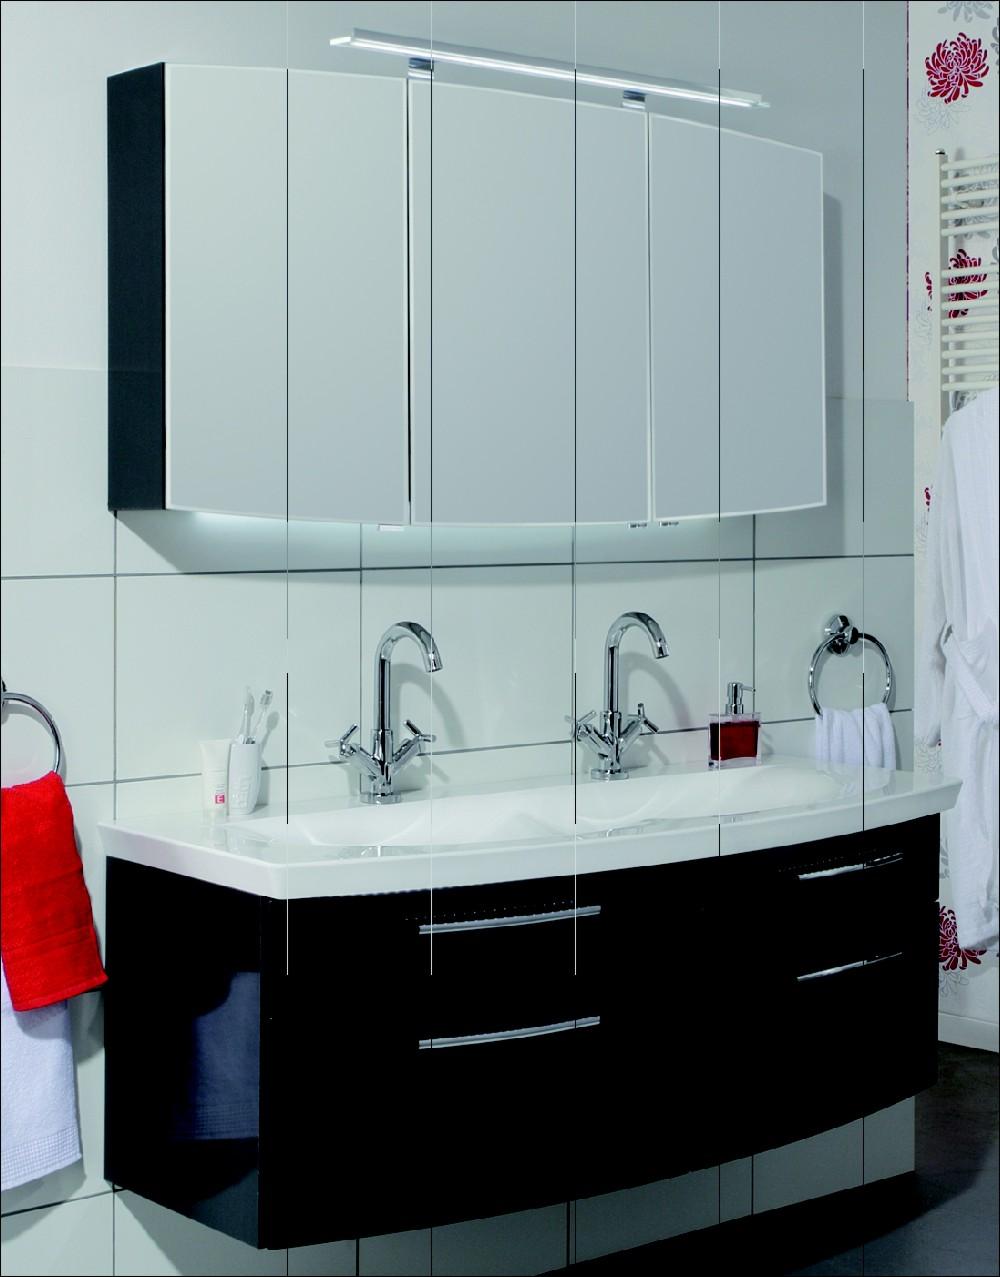 hochschrank classic line badschrank g nstig arcom center. Black Bedroom Furniture Sets. Home Design Ideas